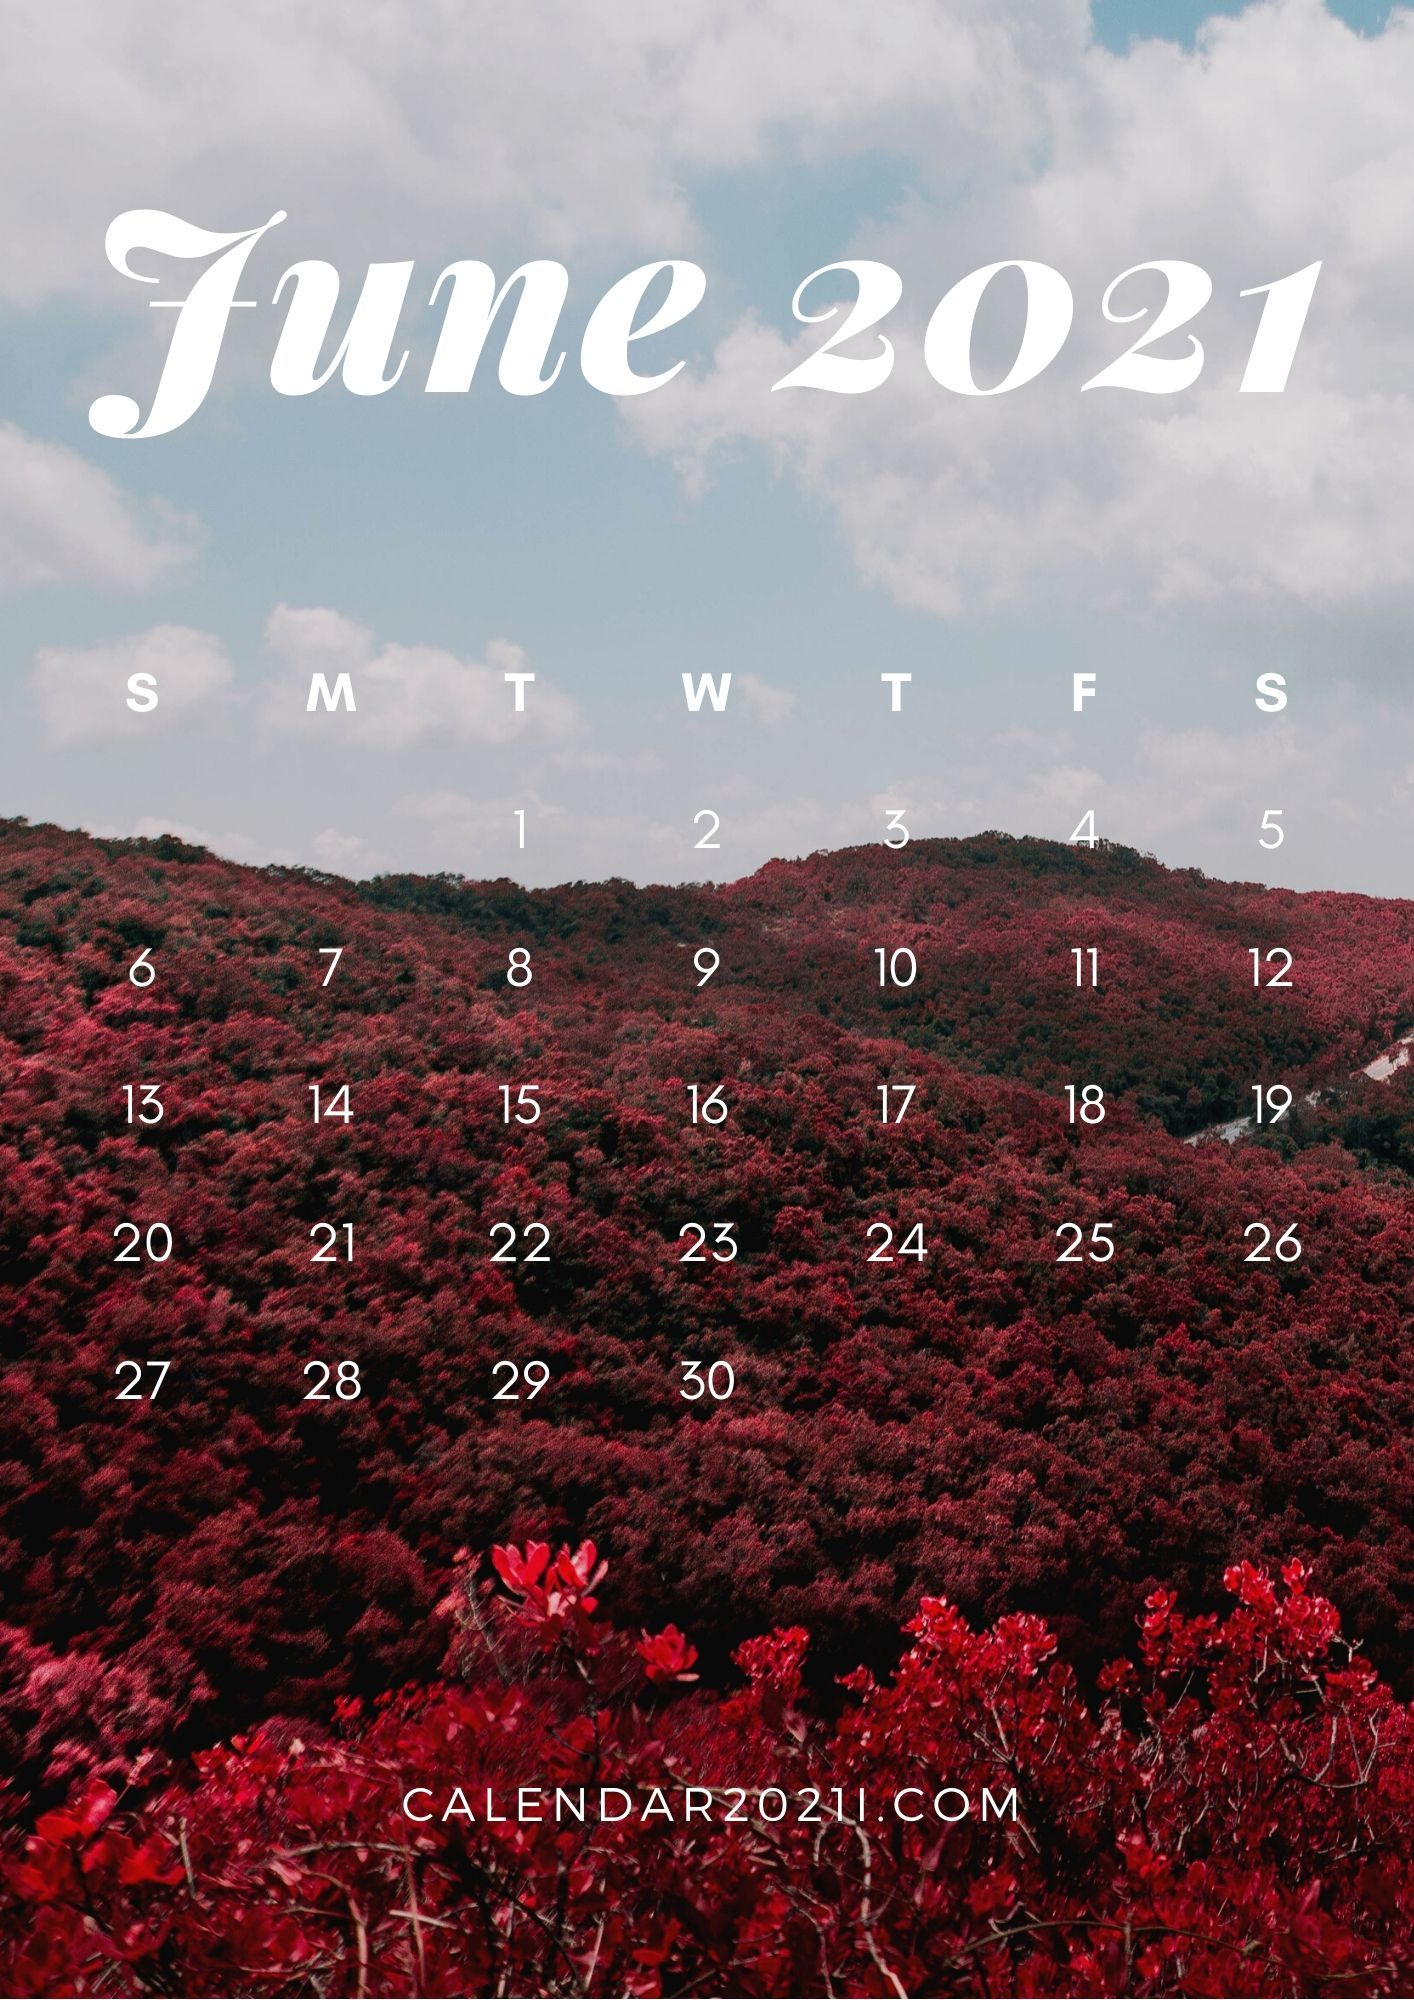 June calendar 2021 hd wallpaper for apple iphone